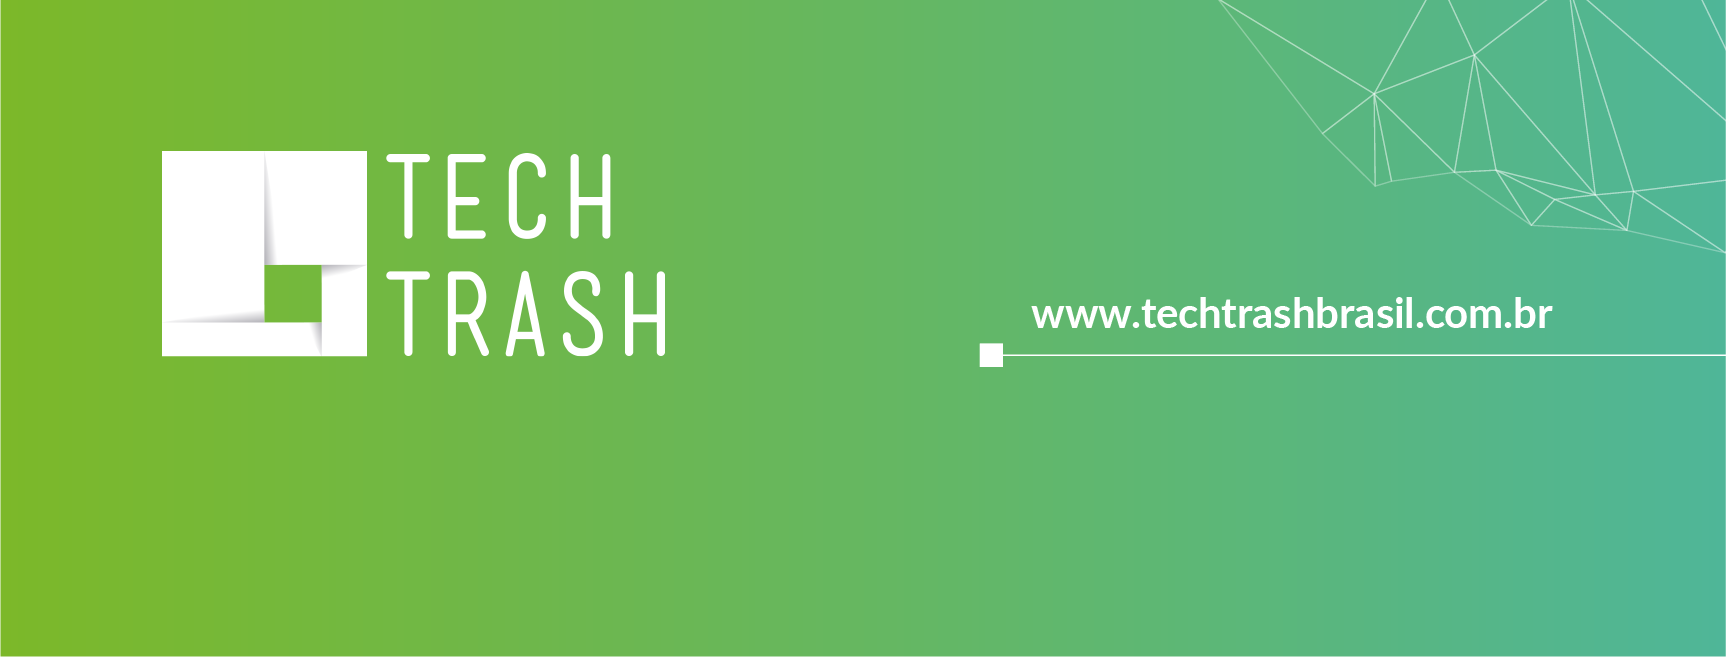 (c) Techtrashbrasil.com.br